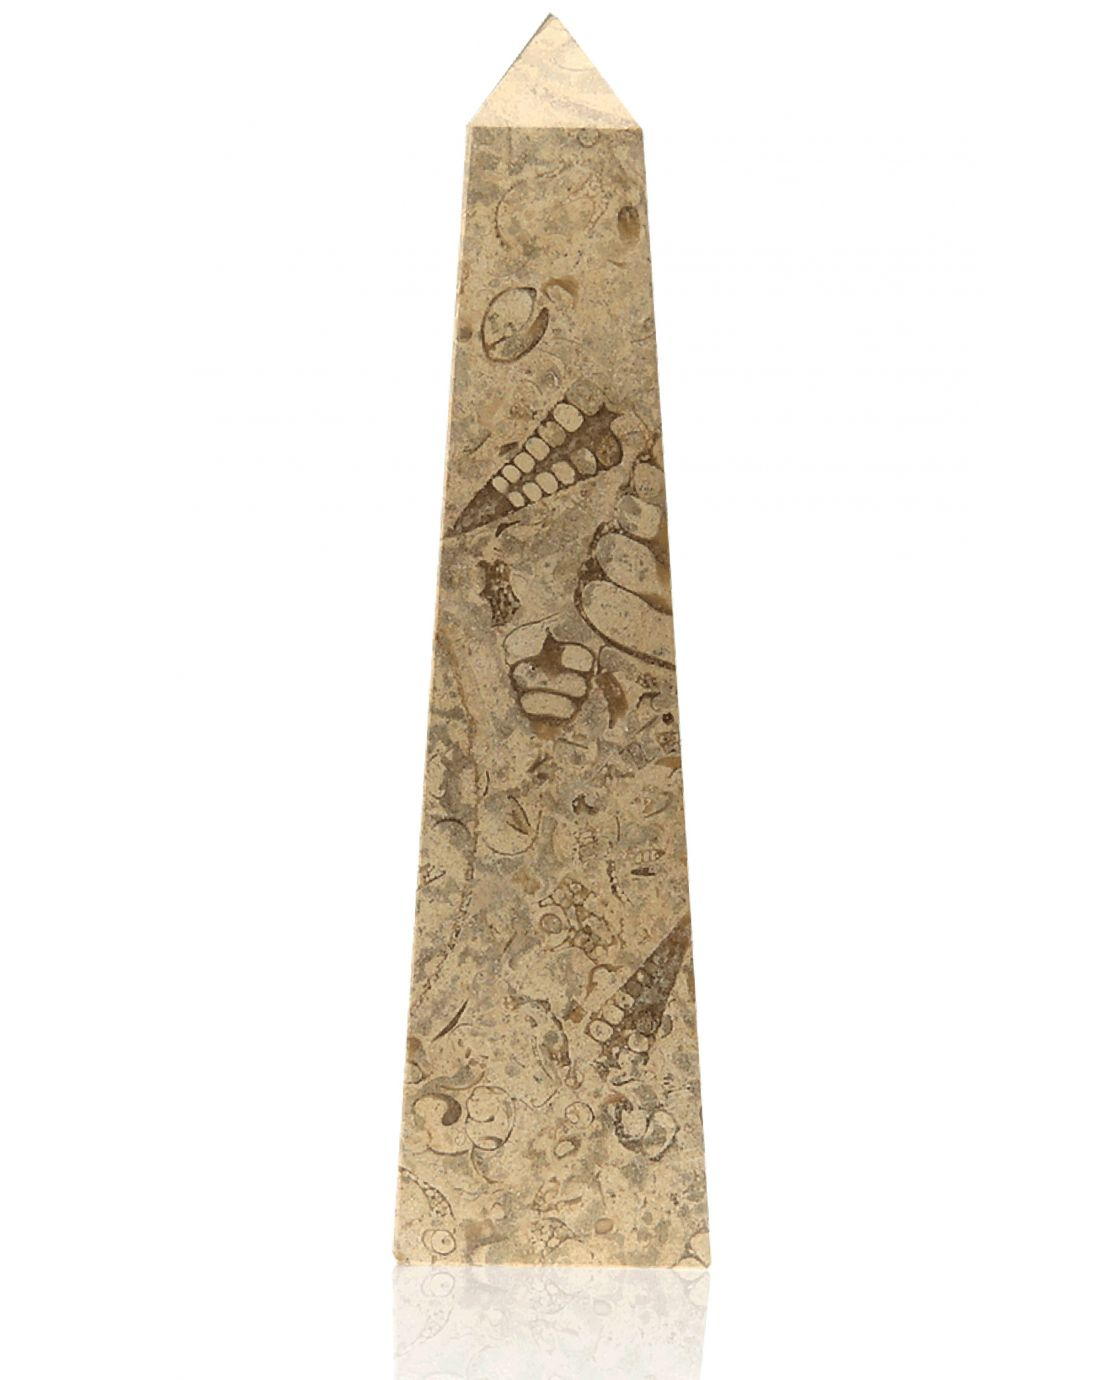 Straight Obelisk Fossil Stone